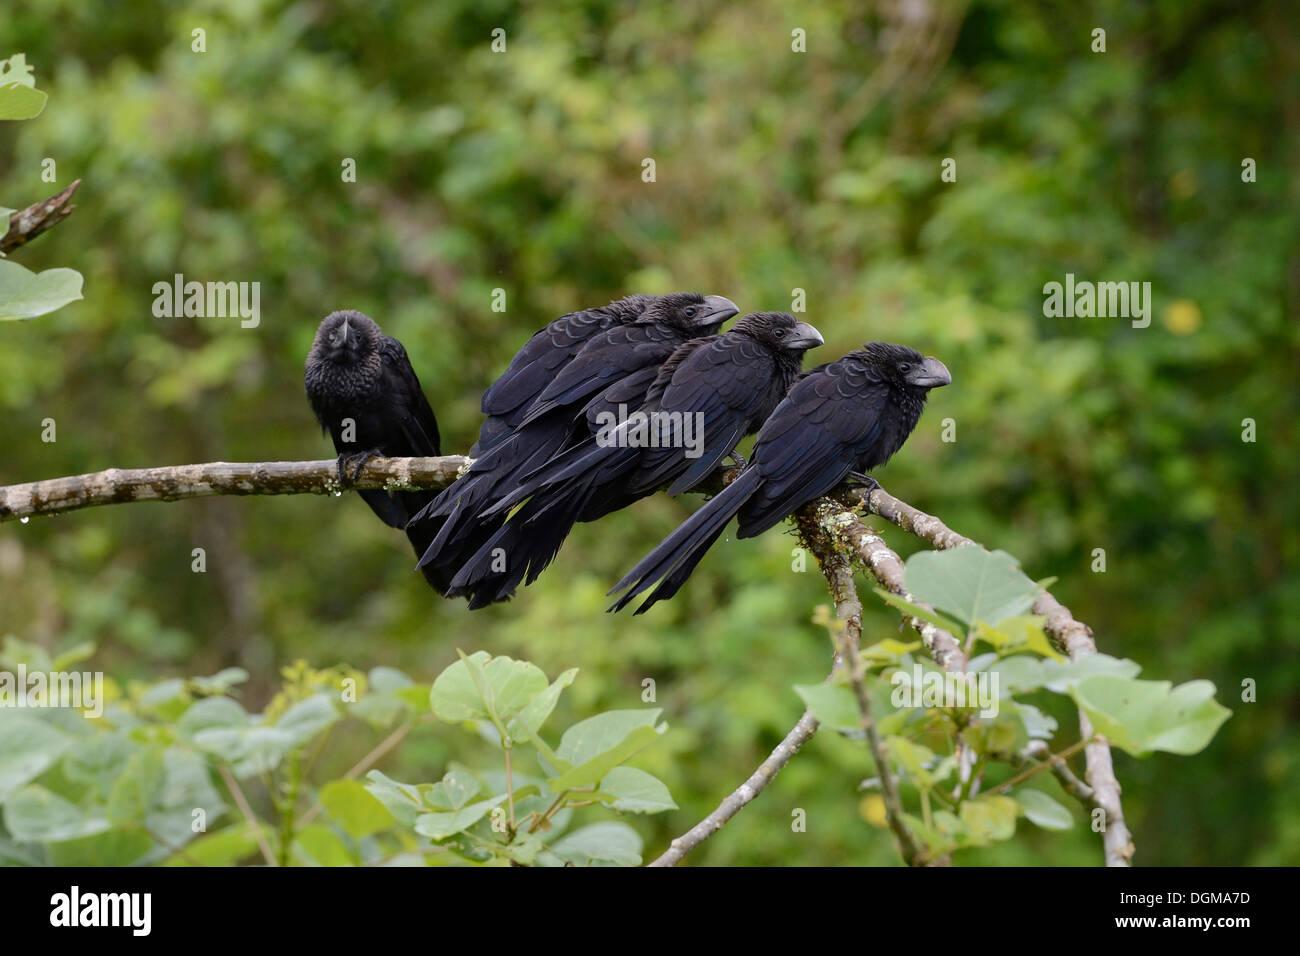 Smooth-billed Ani (Crotophaga ani), Santa Cruz Island, Galapagos, Ecuador, South America - Stock Image